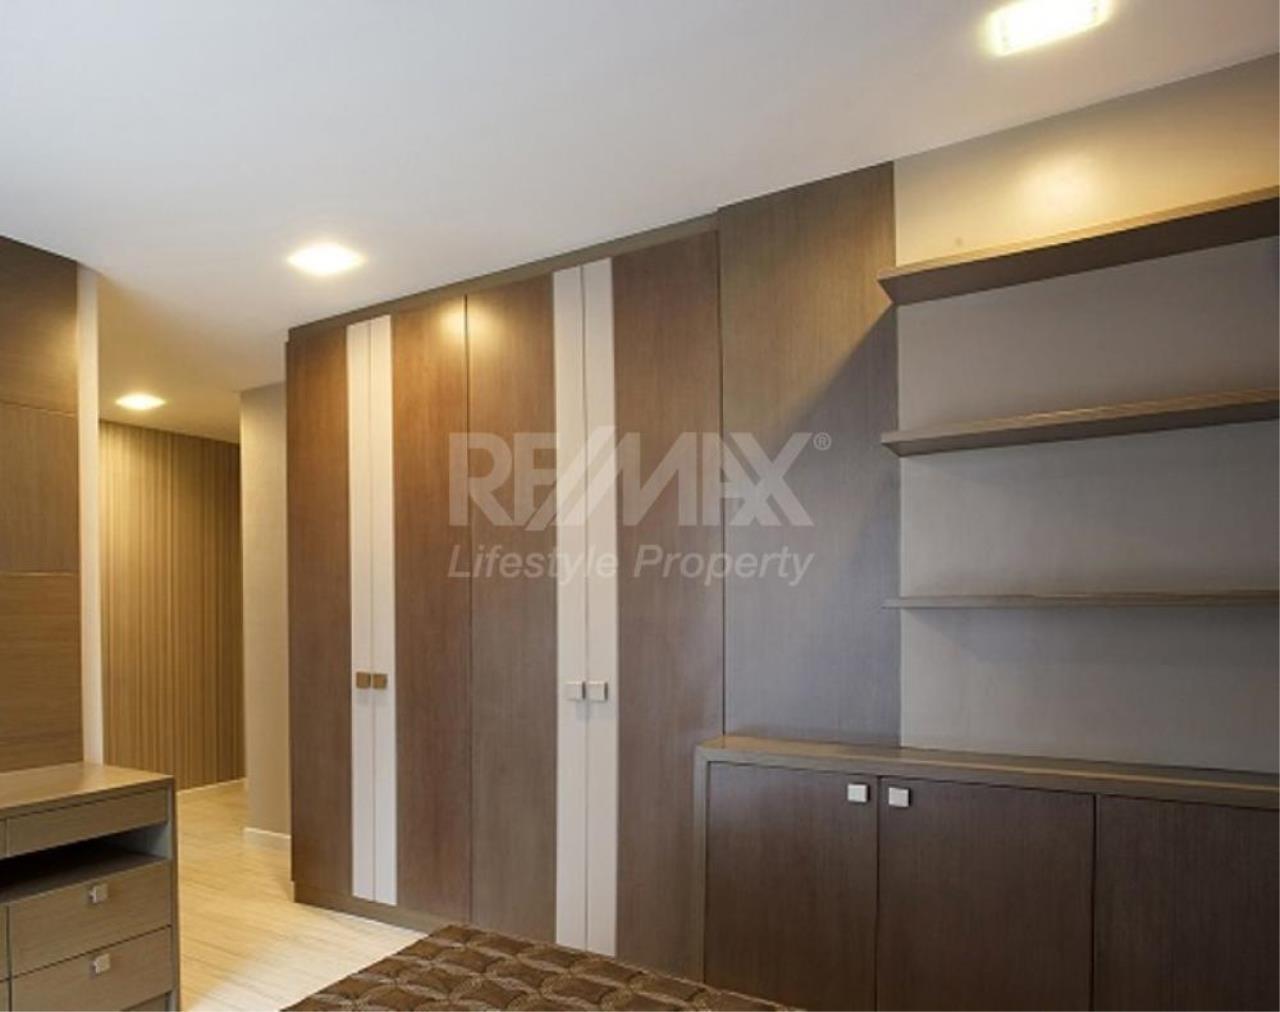 RE/MAX LifeStyle Property Agency's Fernwood Residence 8